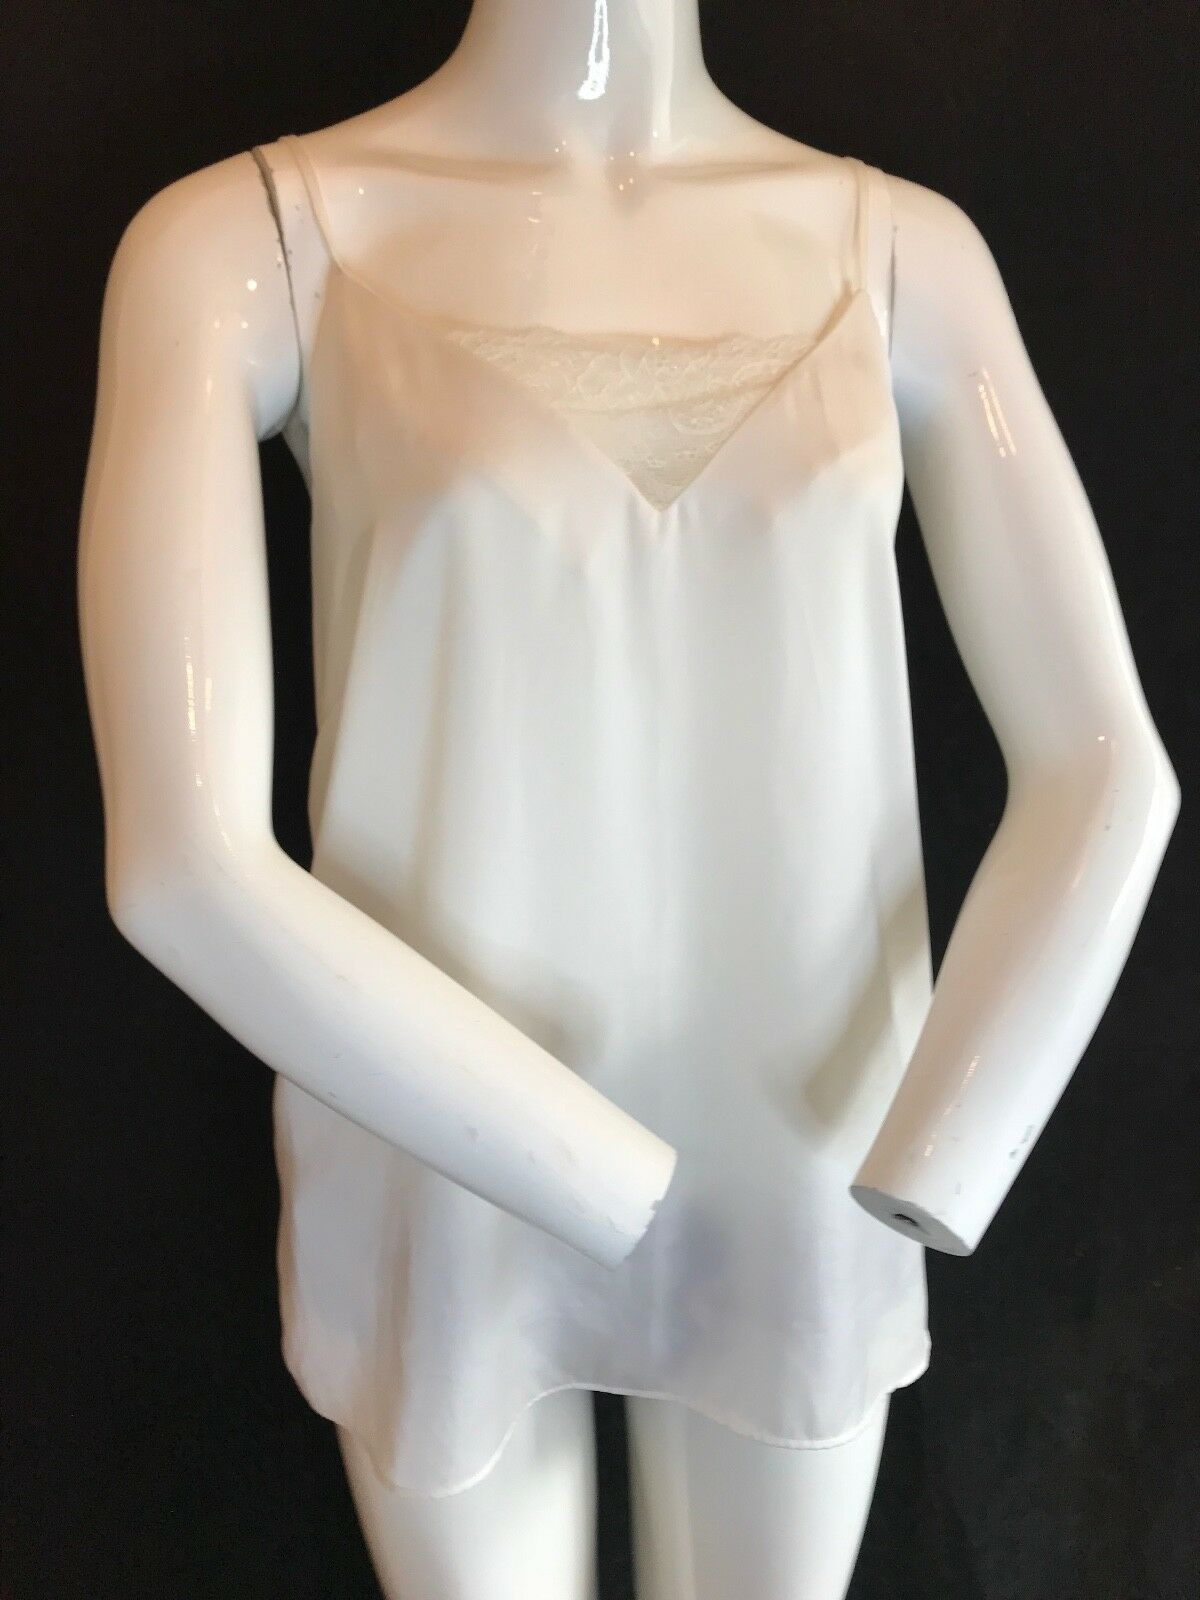 BNWT BIBA Beautiful Lace Detail Strappy Camisole Size 18. Gift Idea